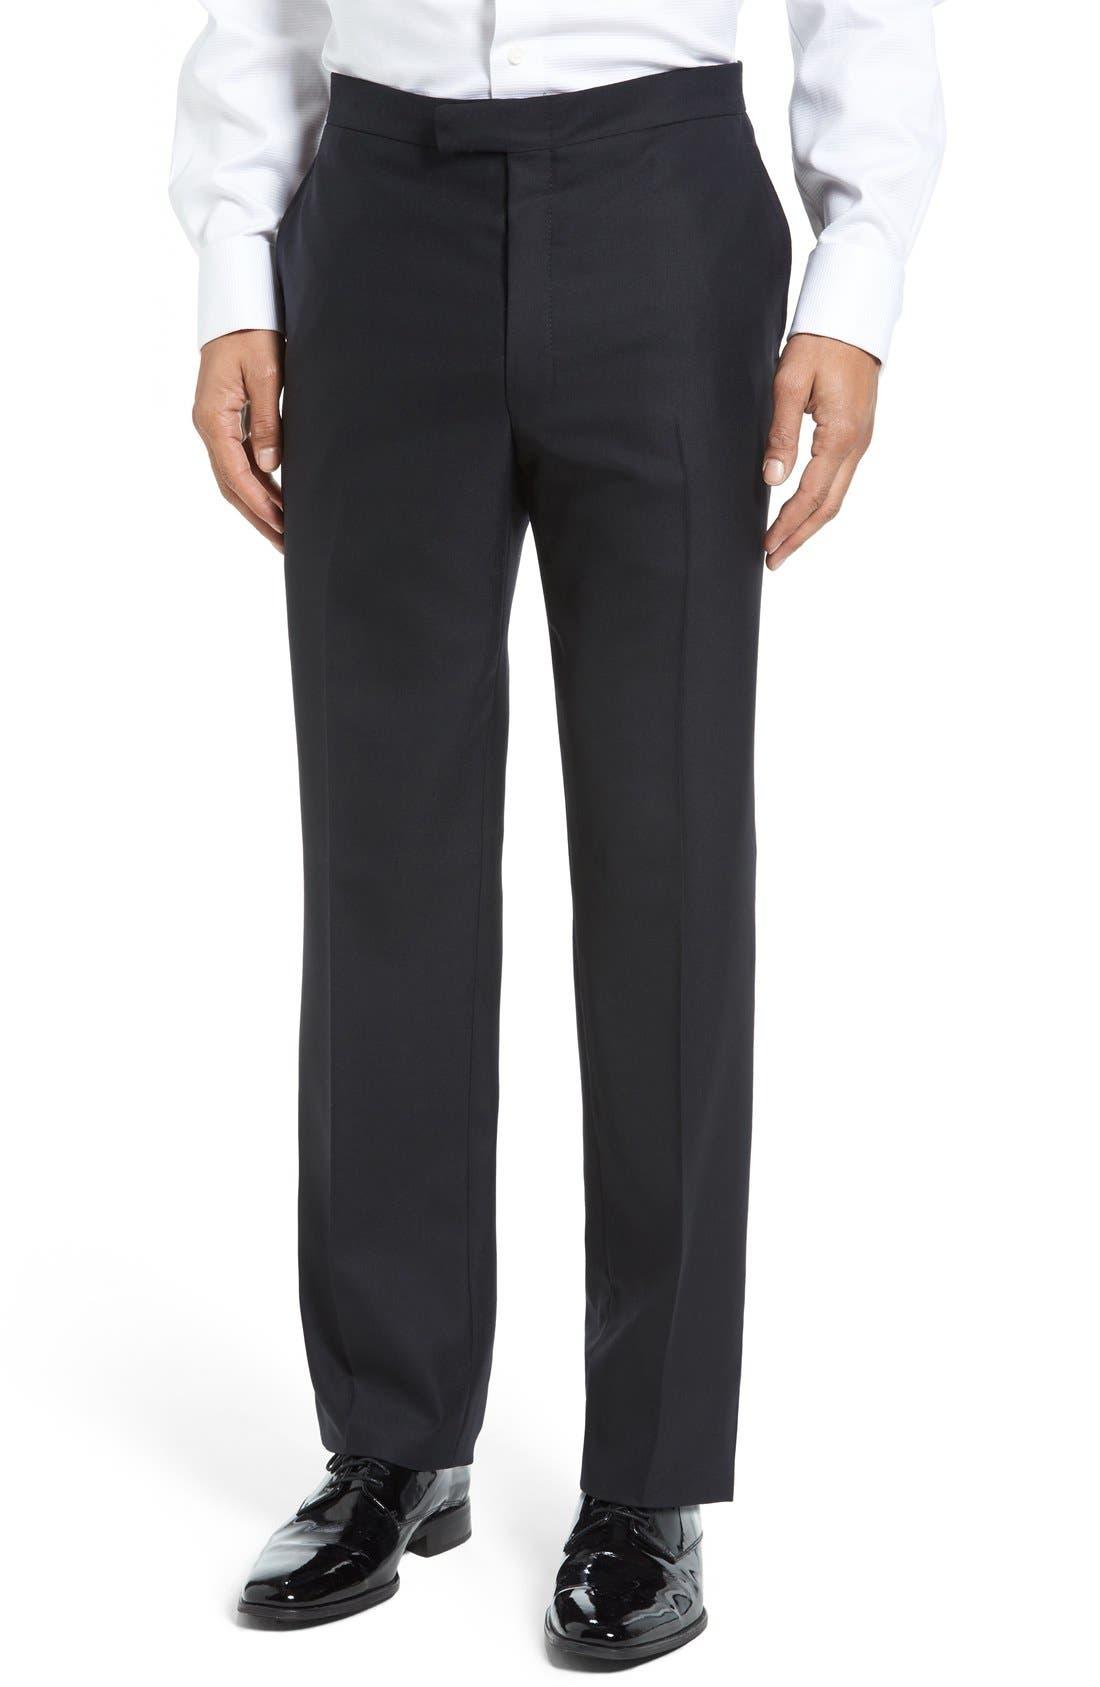 New York Classic Fit Black Wool Tuxedo,                             Alternate thumbnail 8, color,                             BLACK